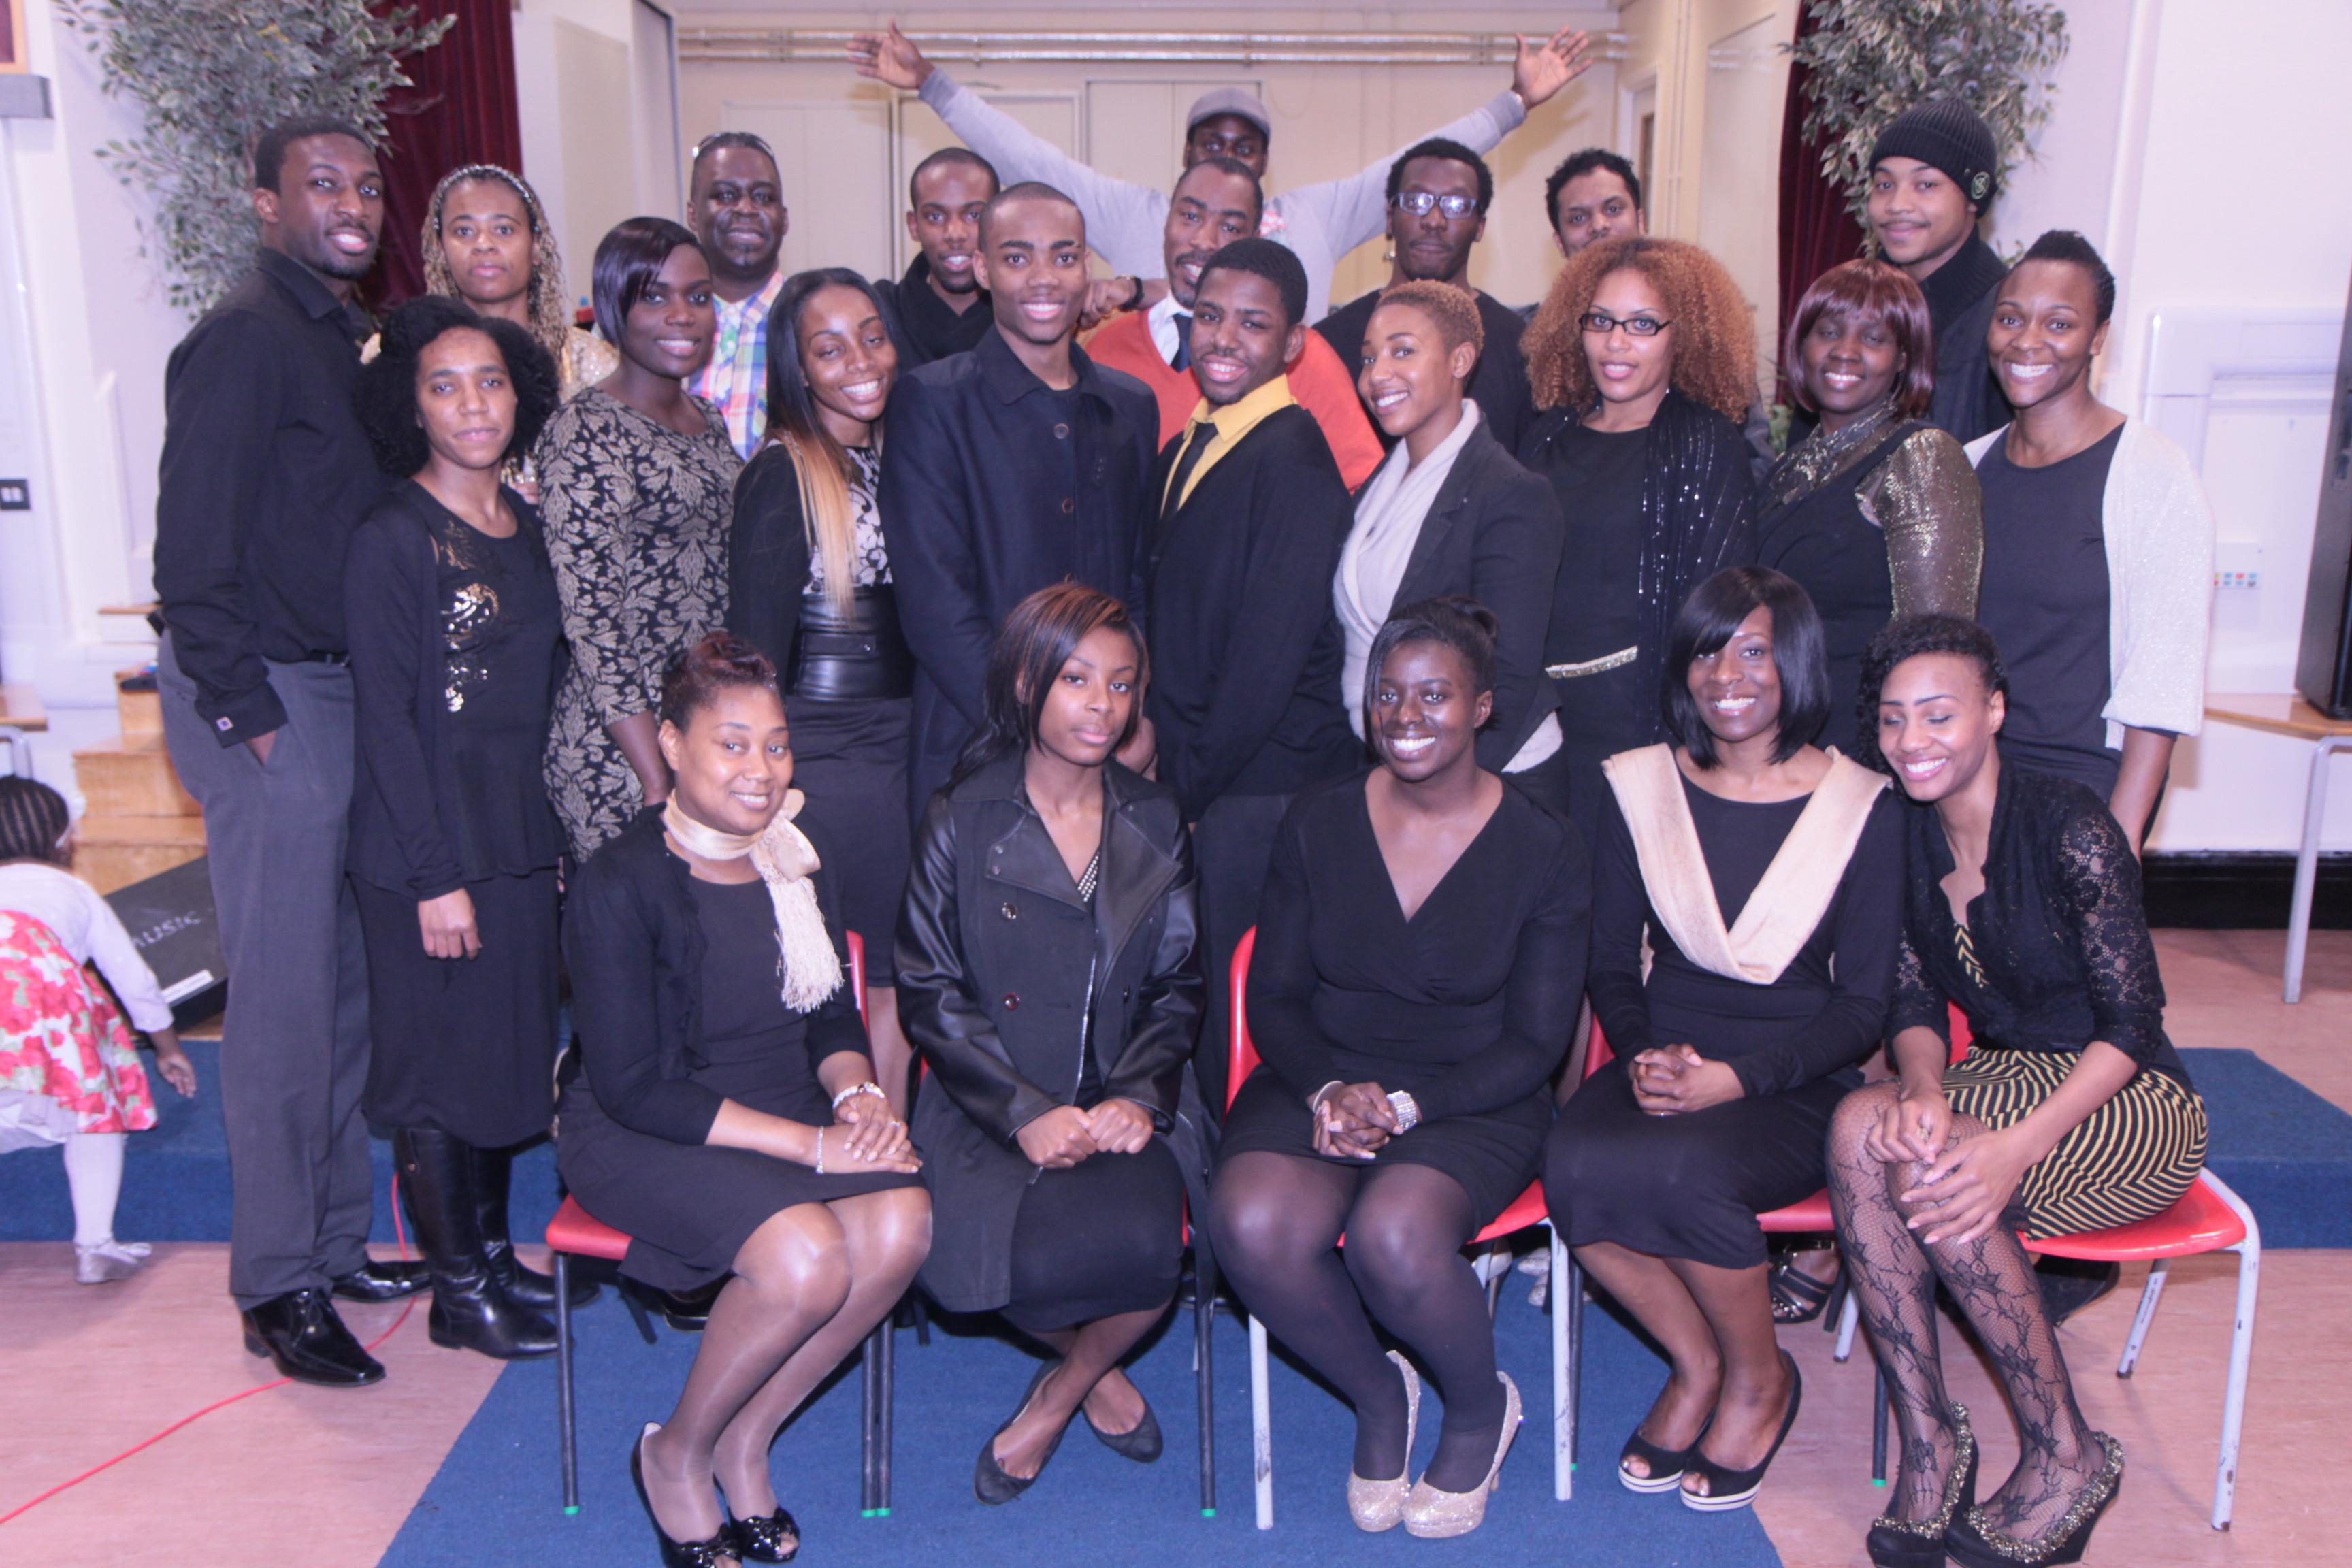 Pathfinders seventh-day adventist uk dating